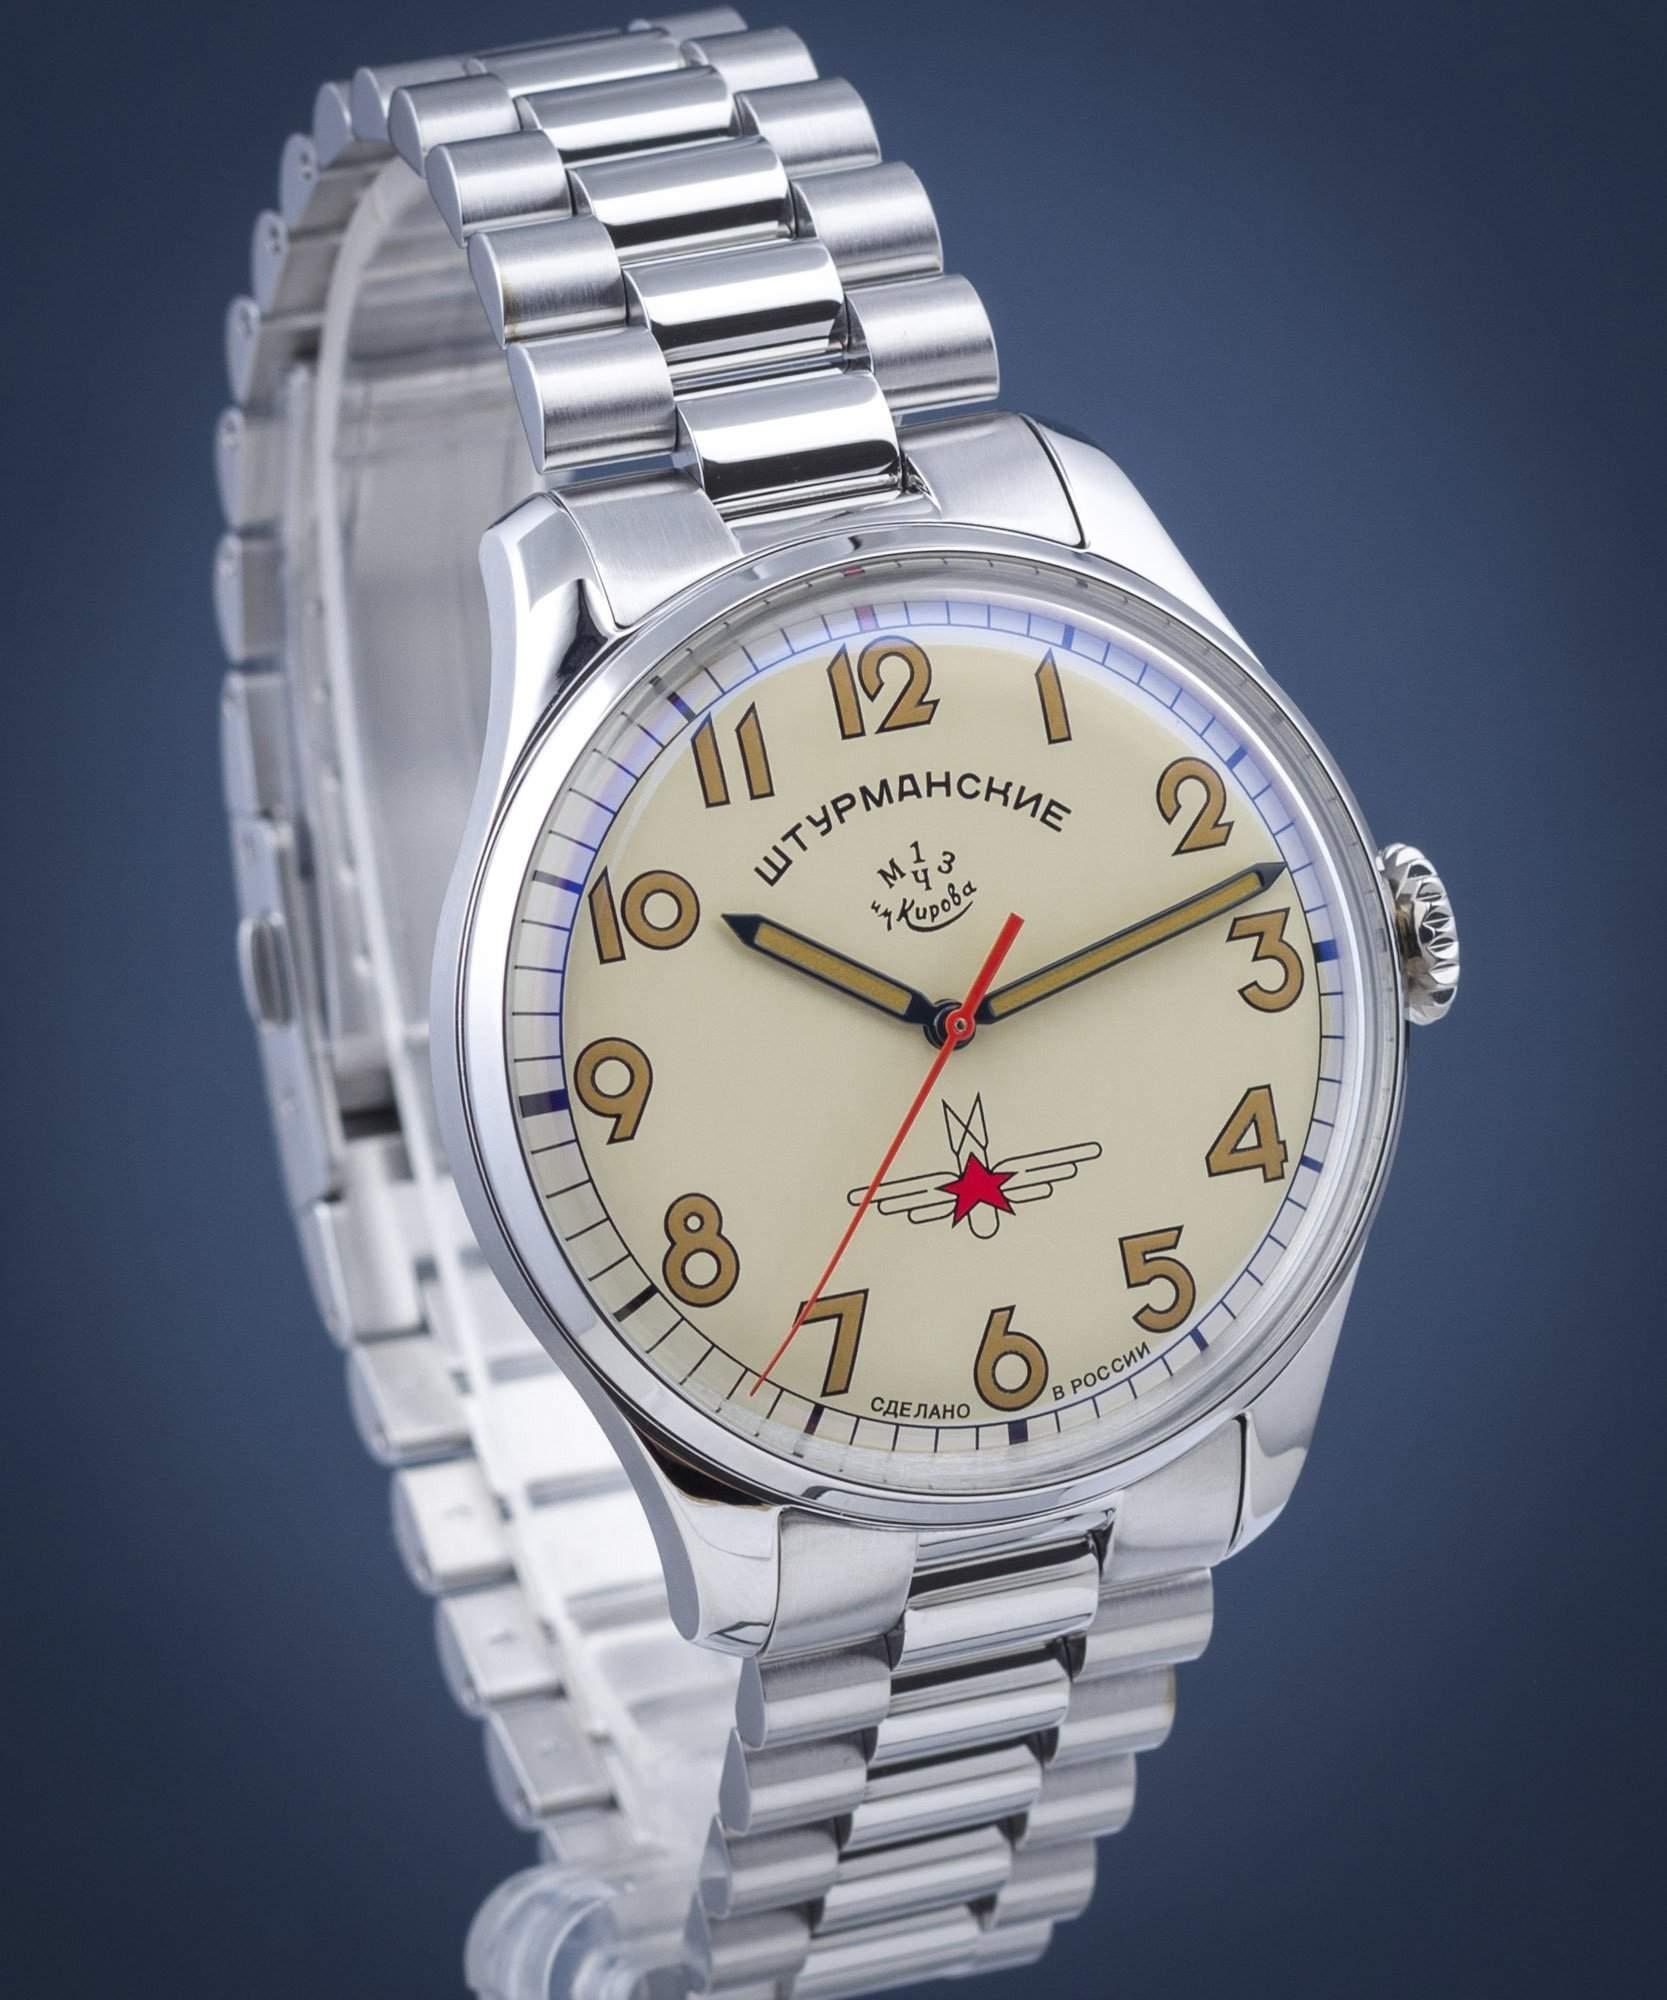 Sturmanskie Gagarin Automatic Limited Edition